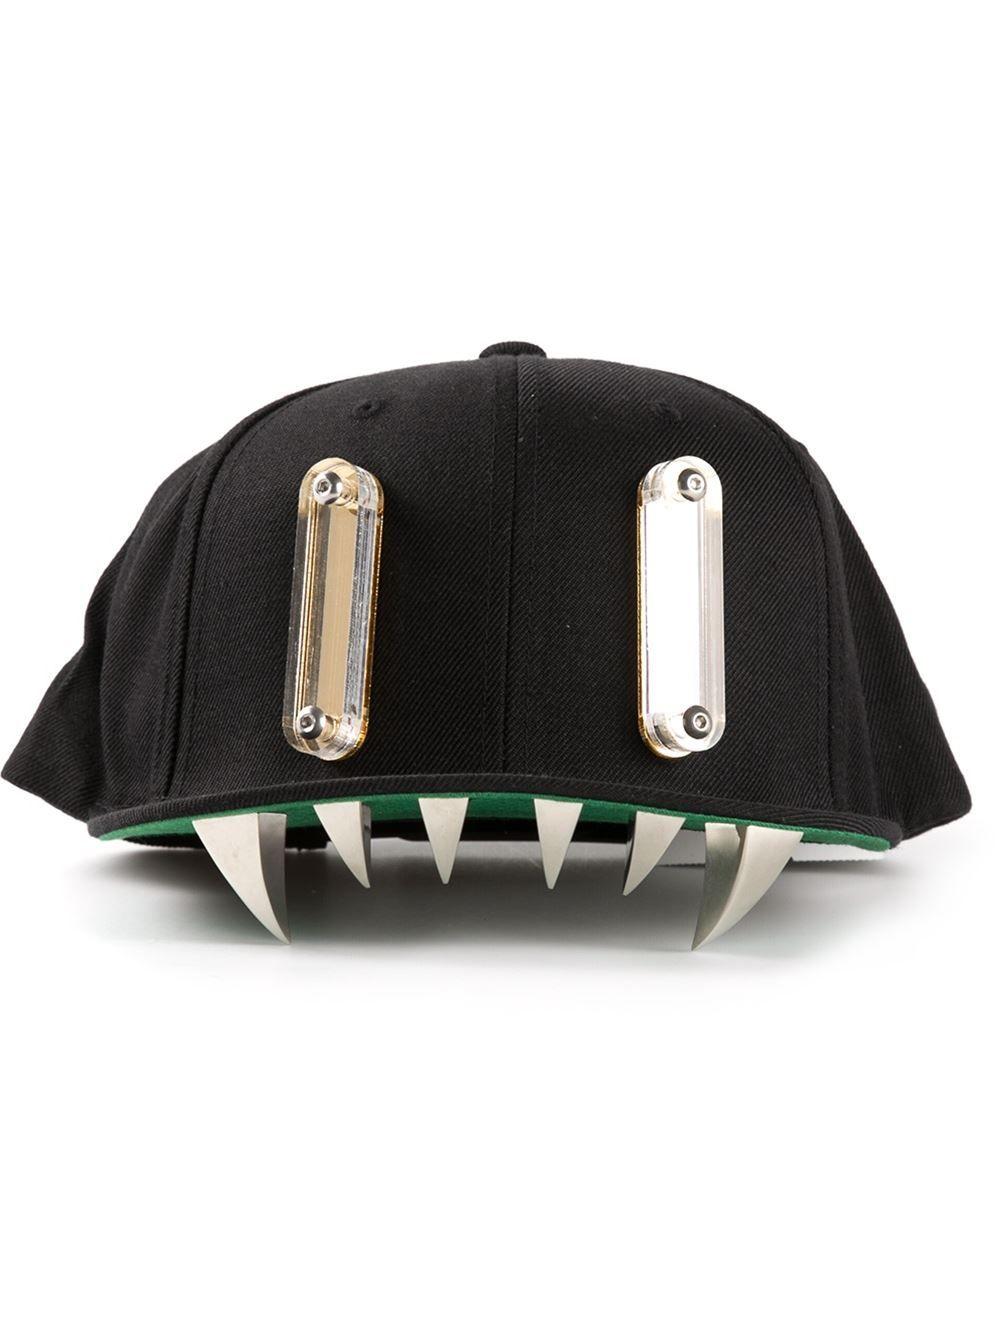 9f3655ad2cd927 Men's Black Chomp Snapback Hat | Zander's Pins | Snapback hats ...